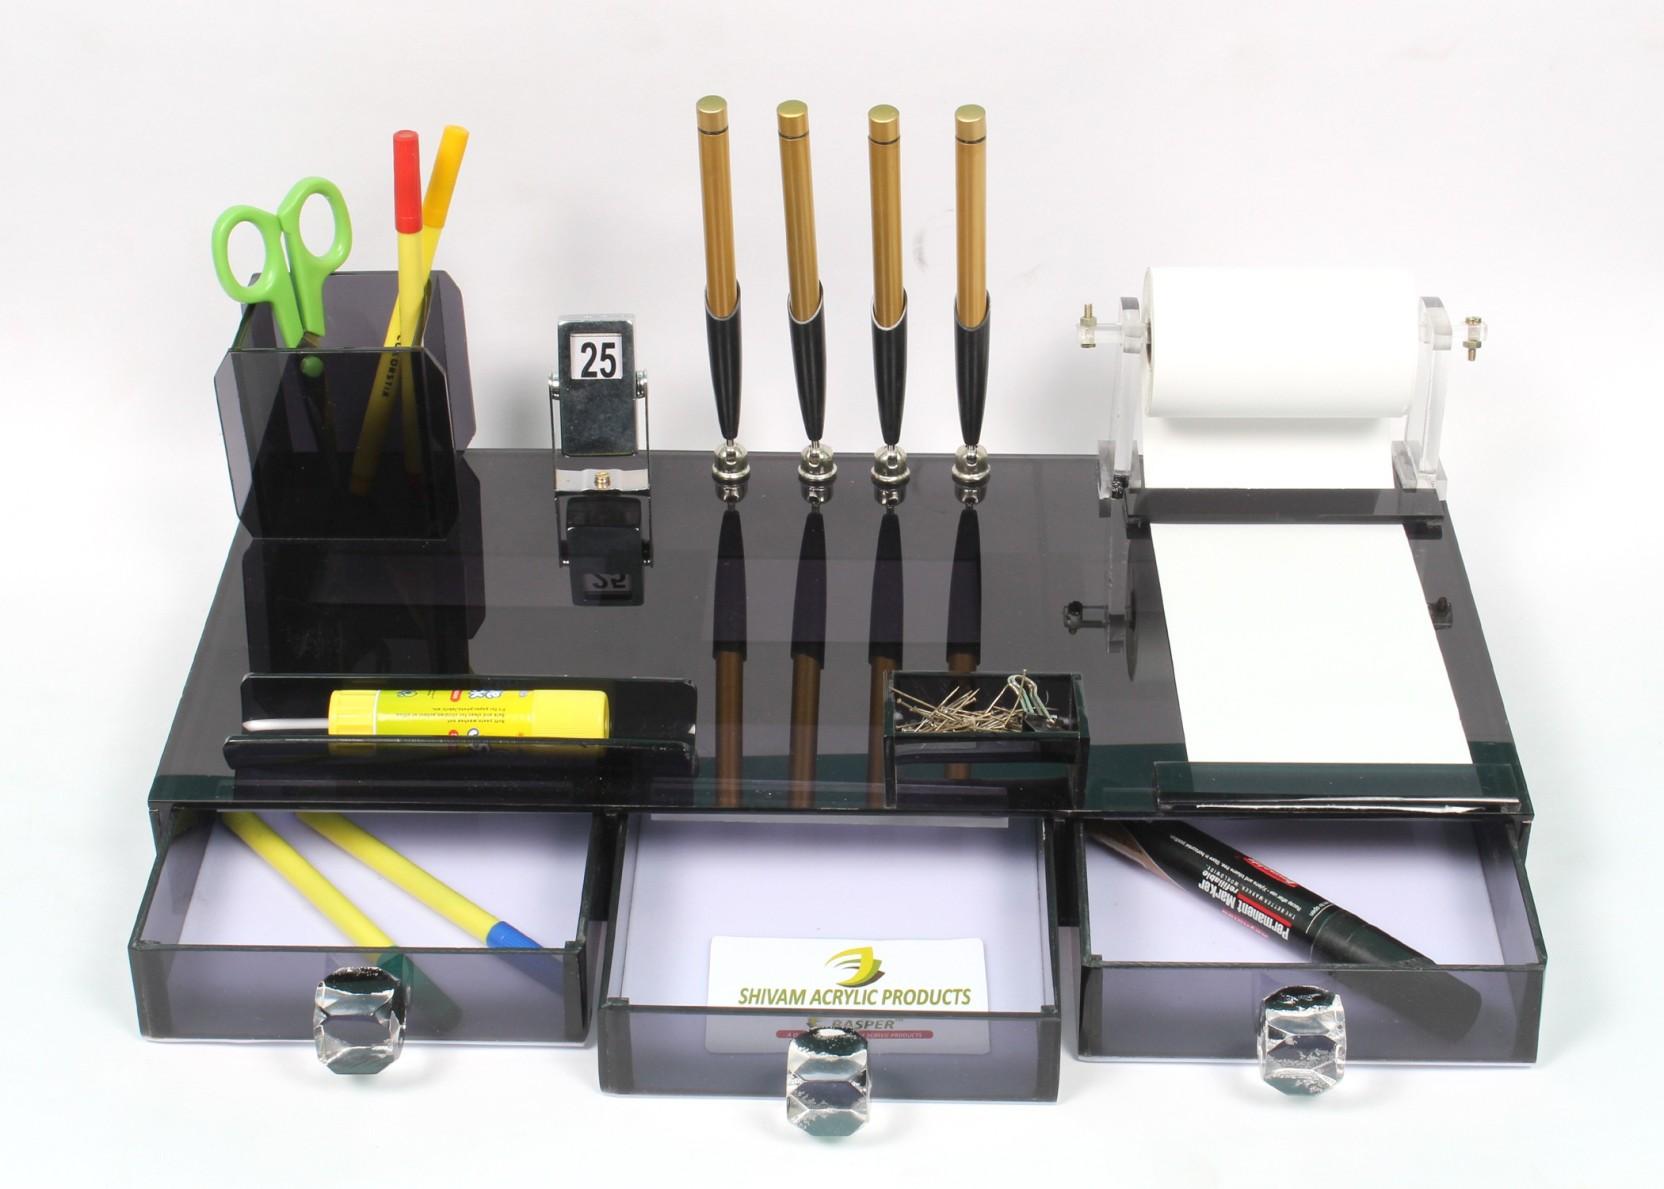 Rasper 6 Compartments High Class Acrylic Pen Stand Faber Castell Neo Slim Ballpoint Stylus Stainless Steel Matt Share